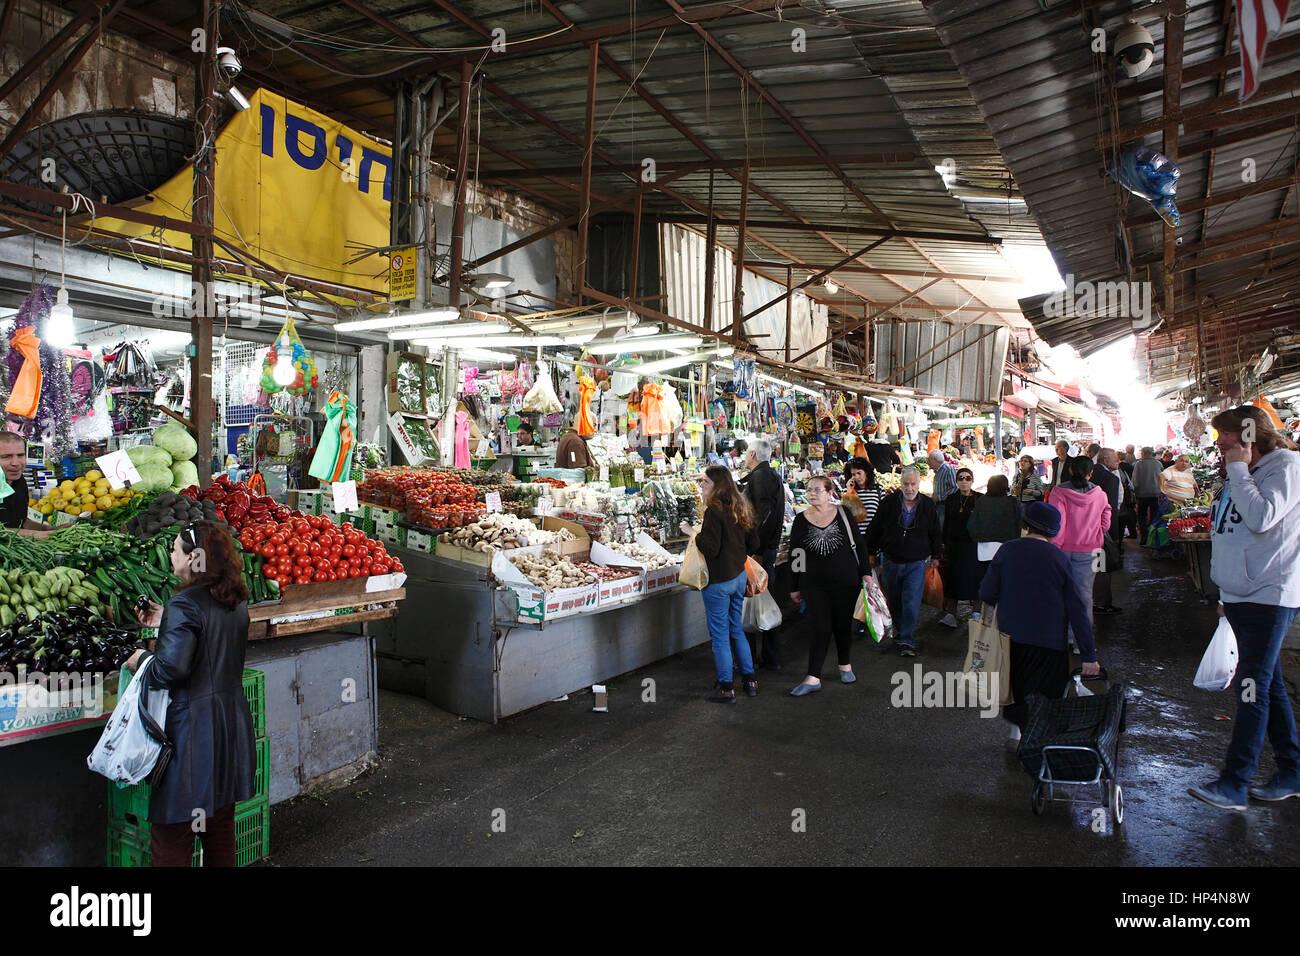 people shopping at carmel market, tel aviv, israel Stock Photo